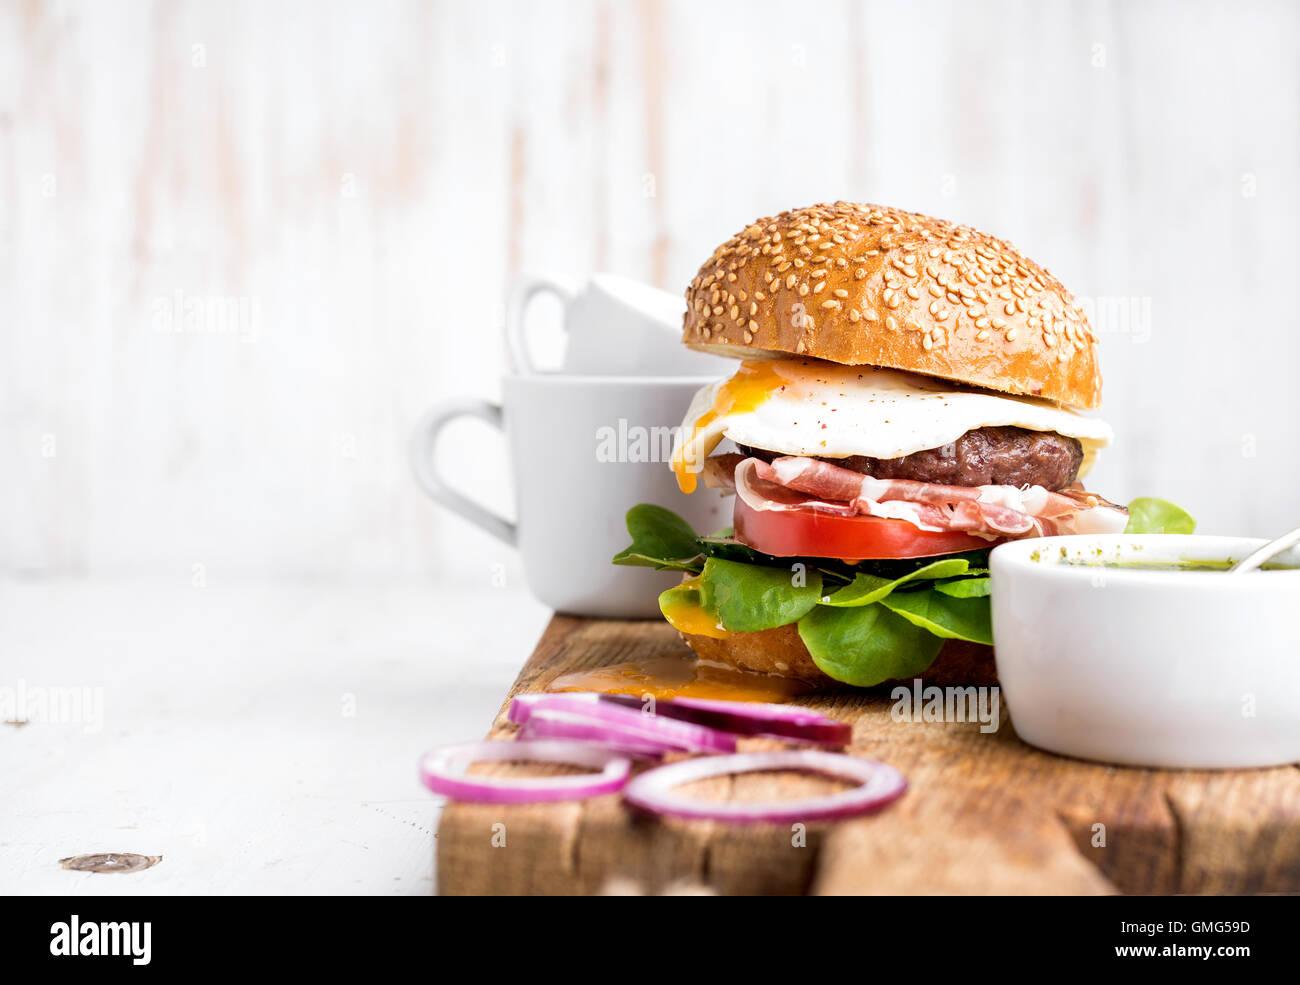 Hamburger Restaurant Stock Photos & Hamburger Restaurant Stock ...